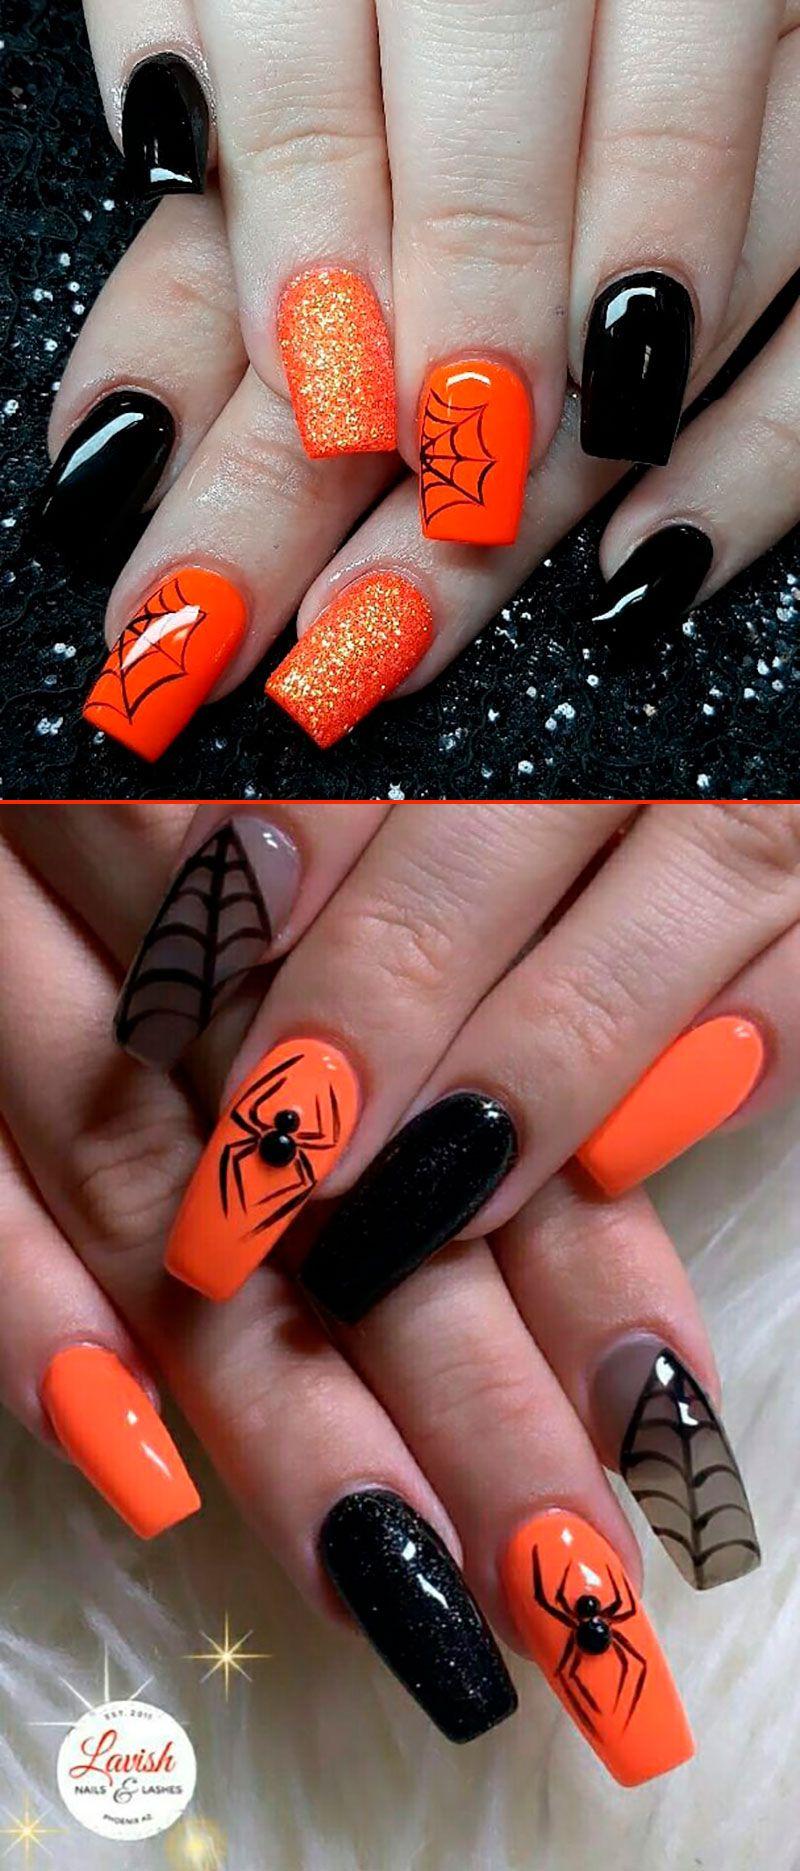 Pinterest Mnnxcxx Halloween Nails Sassy Nails Halloween Nail Designs